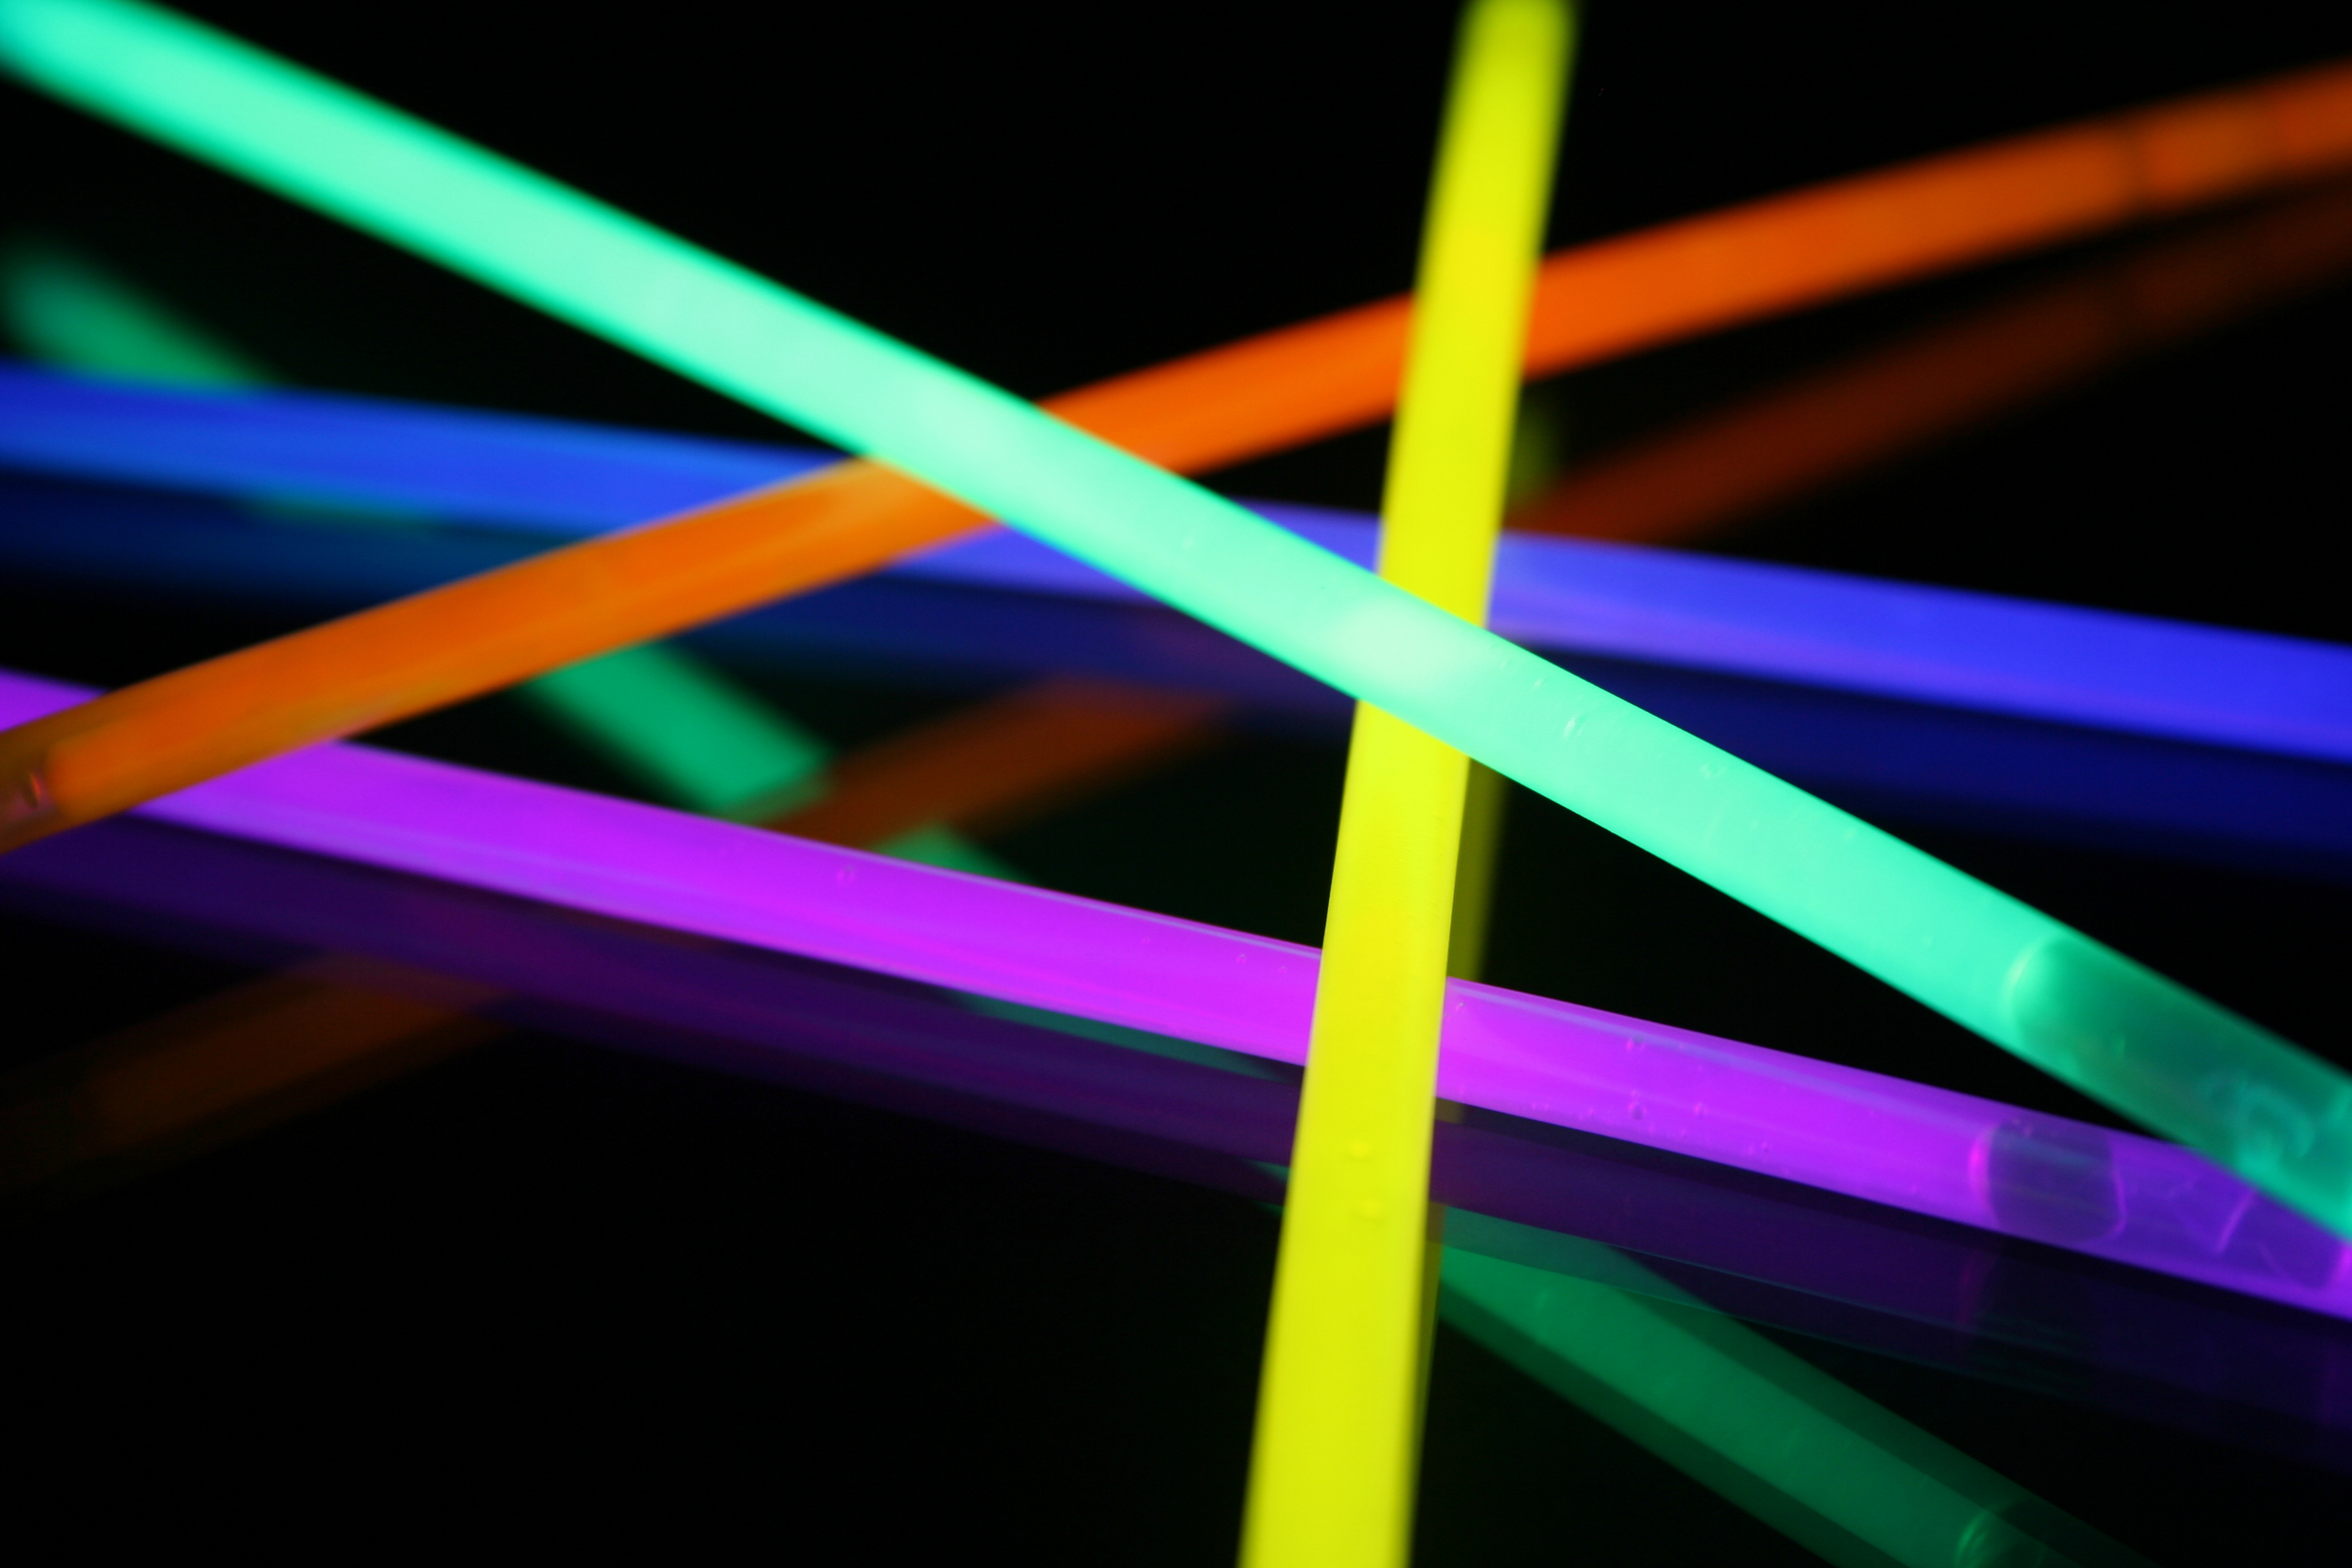 glow sticks Nicaboynecom: glow sticks, necklaces, glow golf, light up toys, and promotional products.